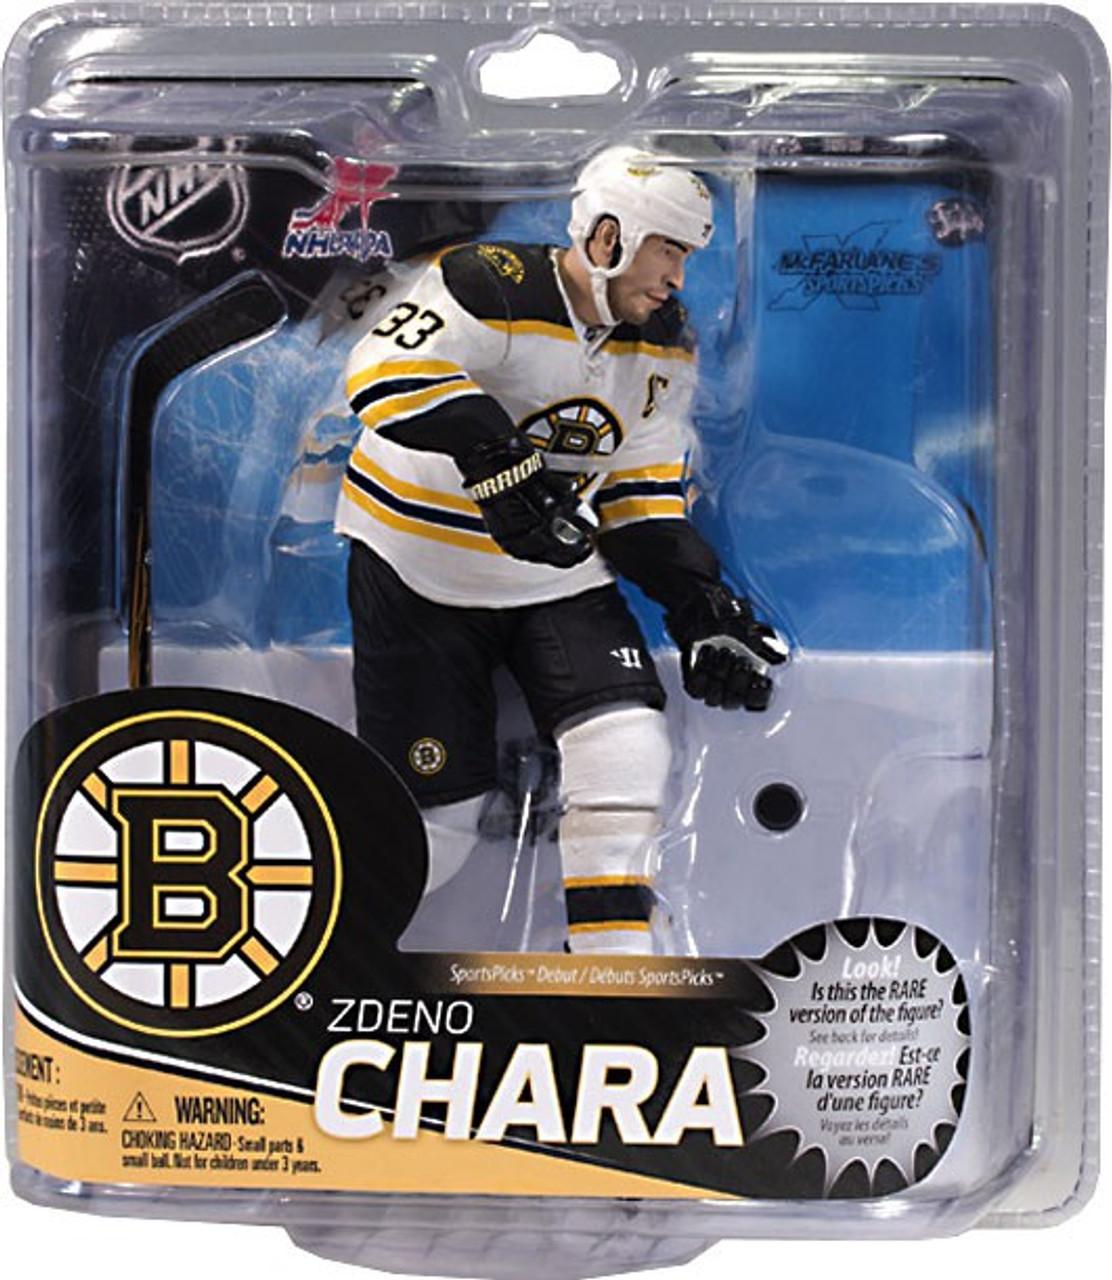 buy popular 548e8 751c9 McFarlane Toys NHL Boston Bruins Sports Picks Series 31 Zdeno Chara Action  Figure [White Jersey]